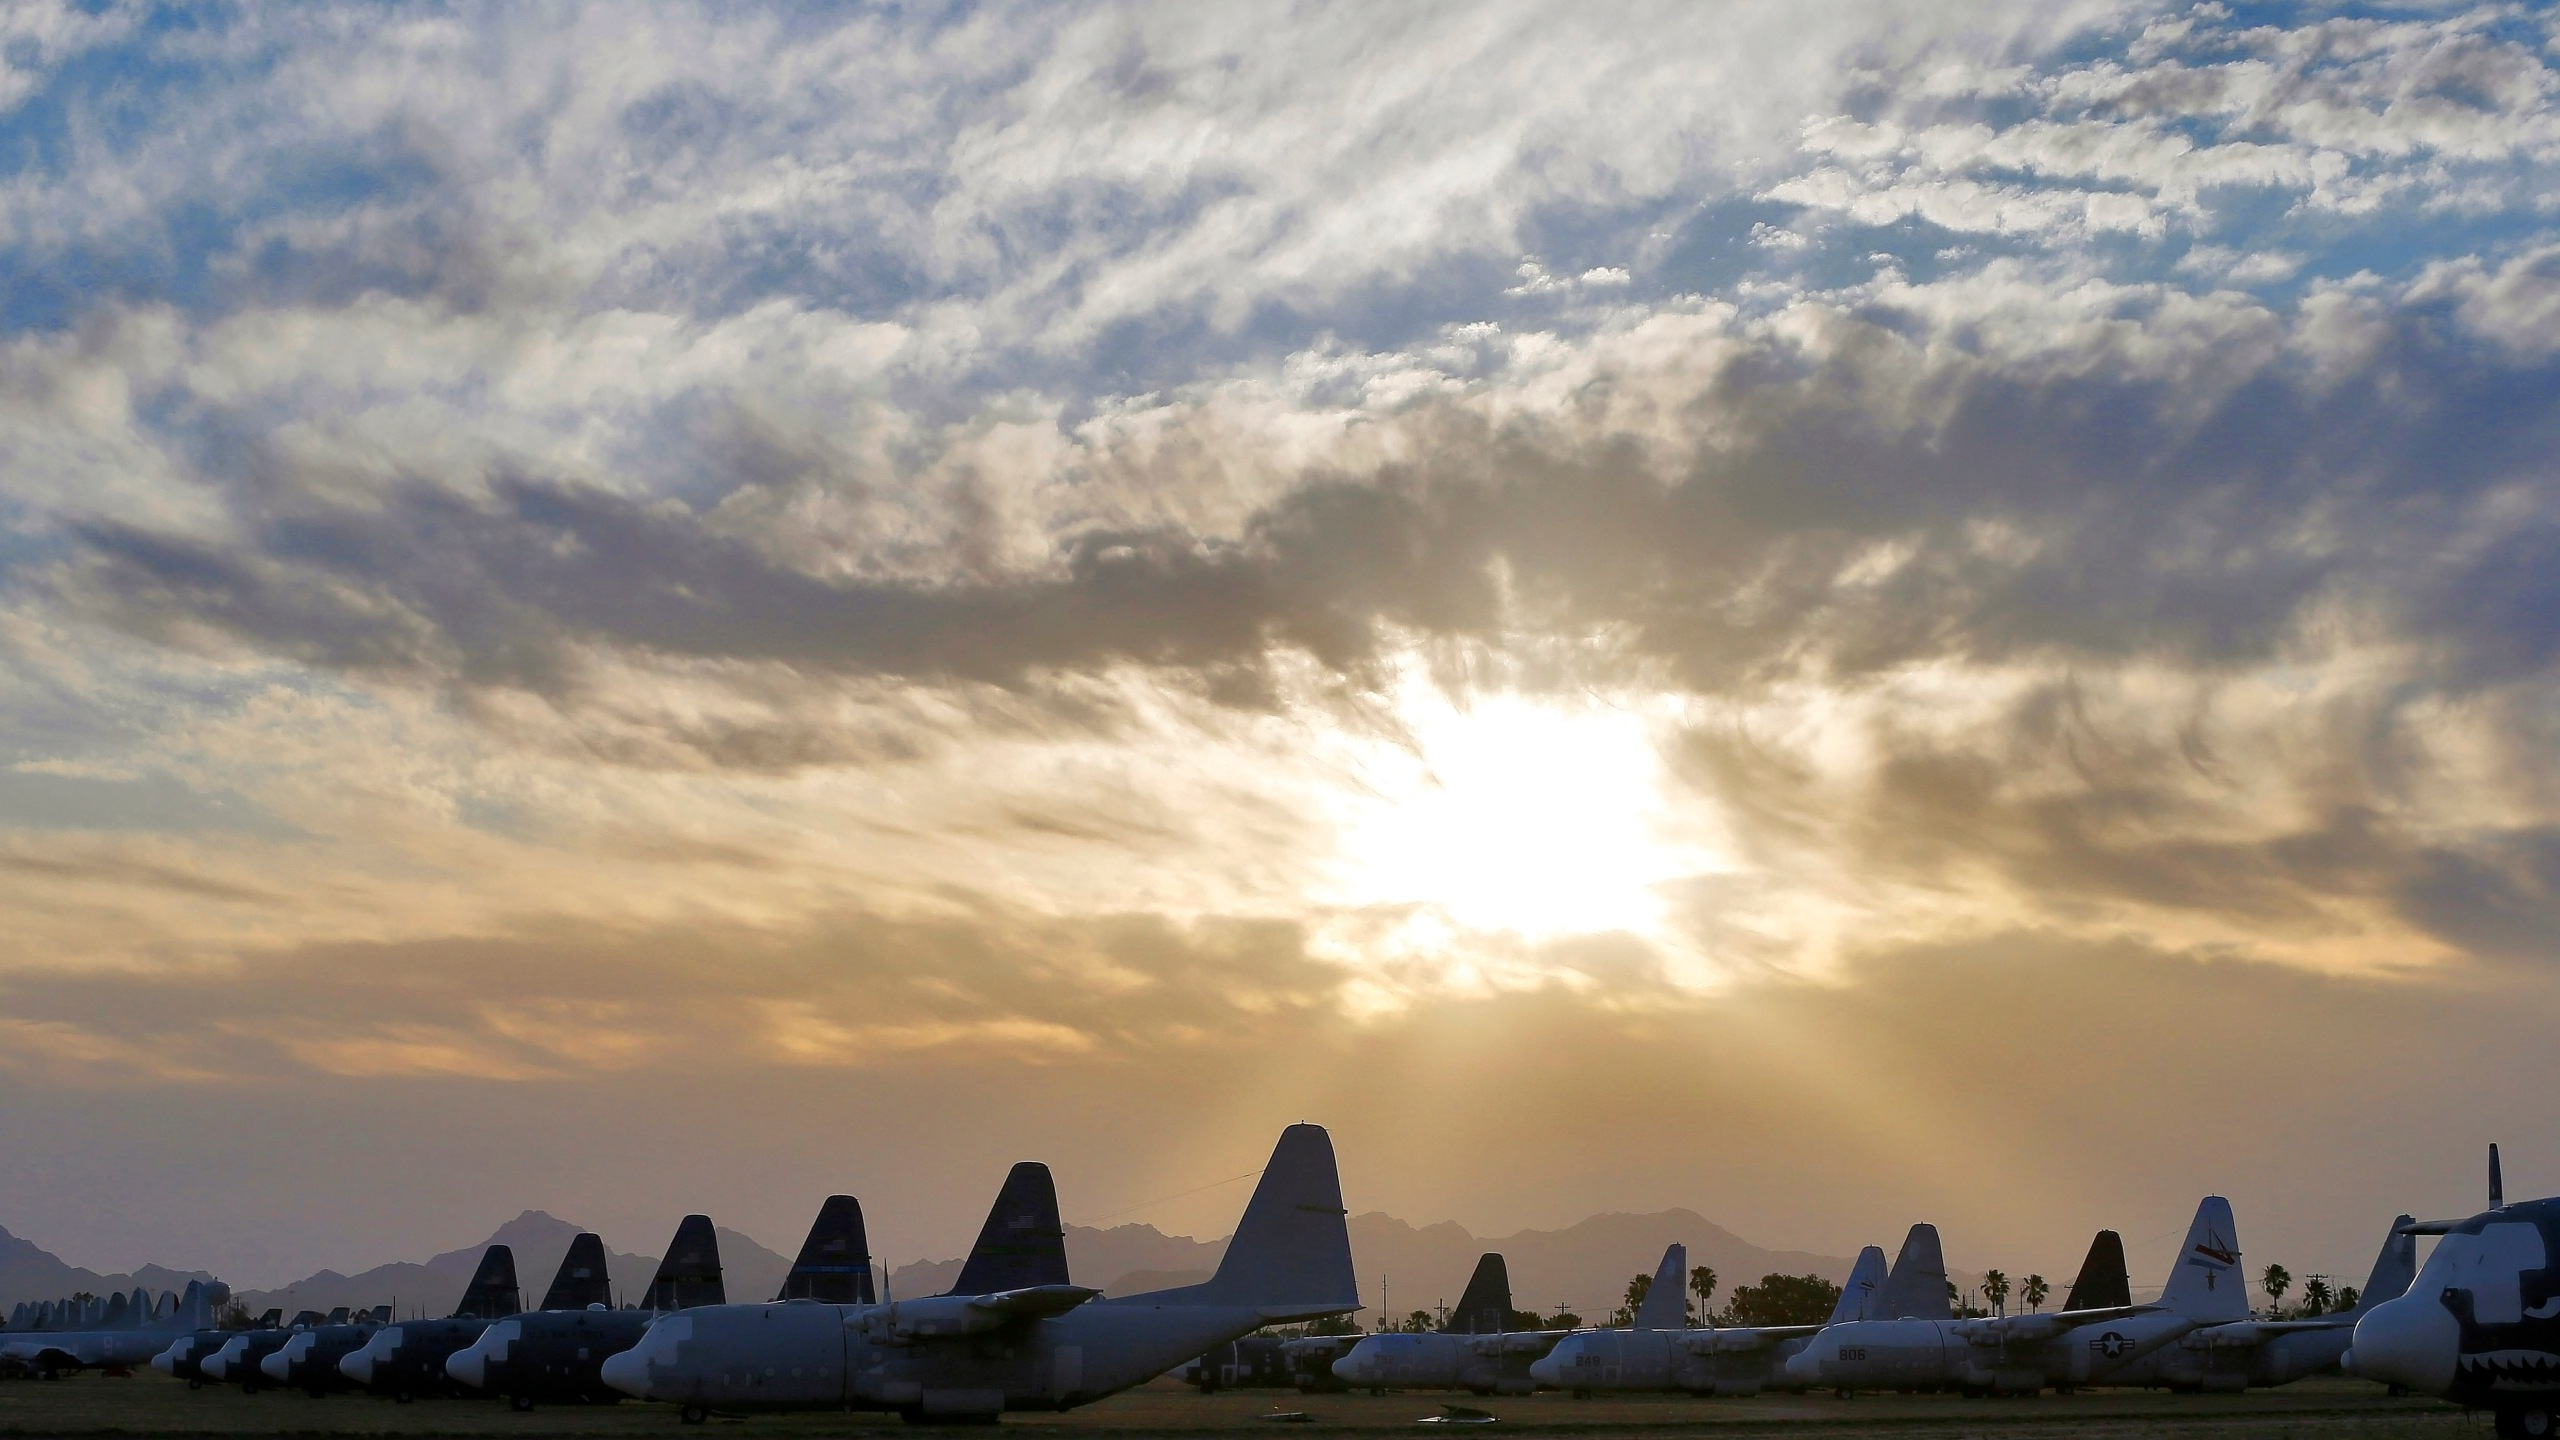 Military Aircraft Boneyard Photo Essay Photo by Matt York, AP Photo_269064